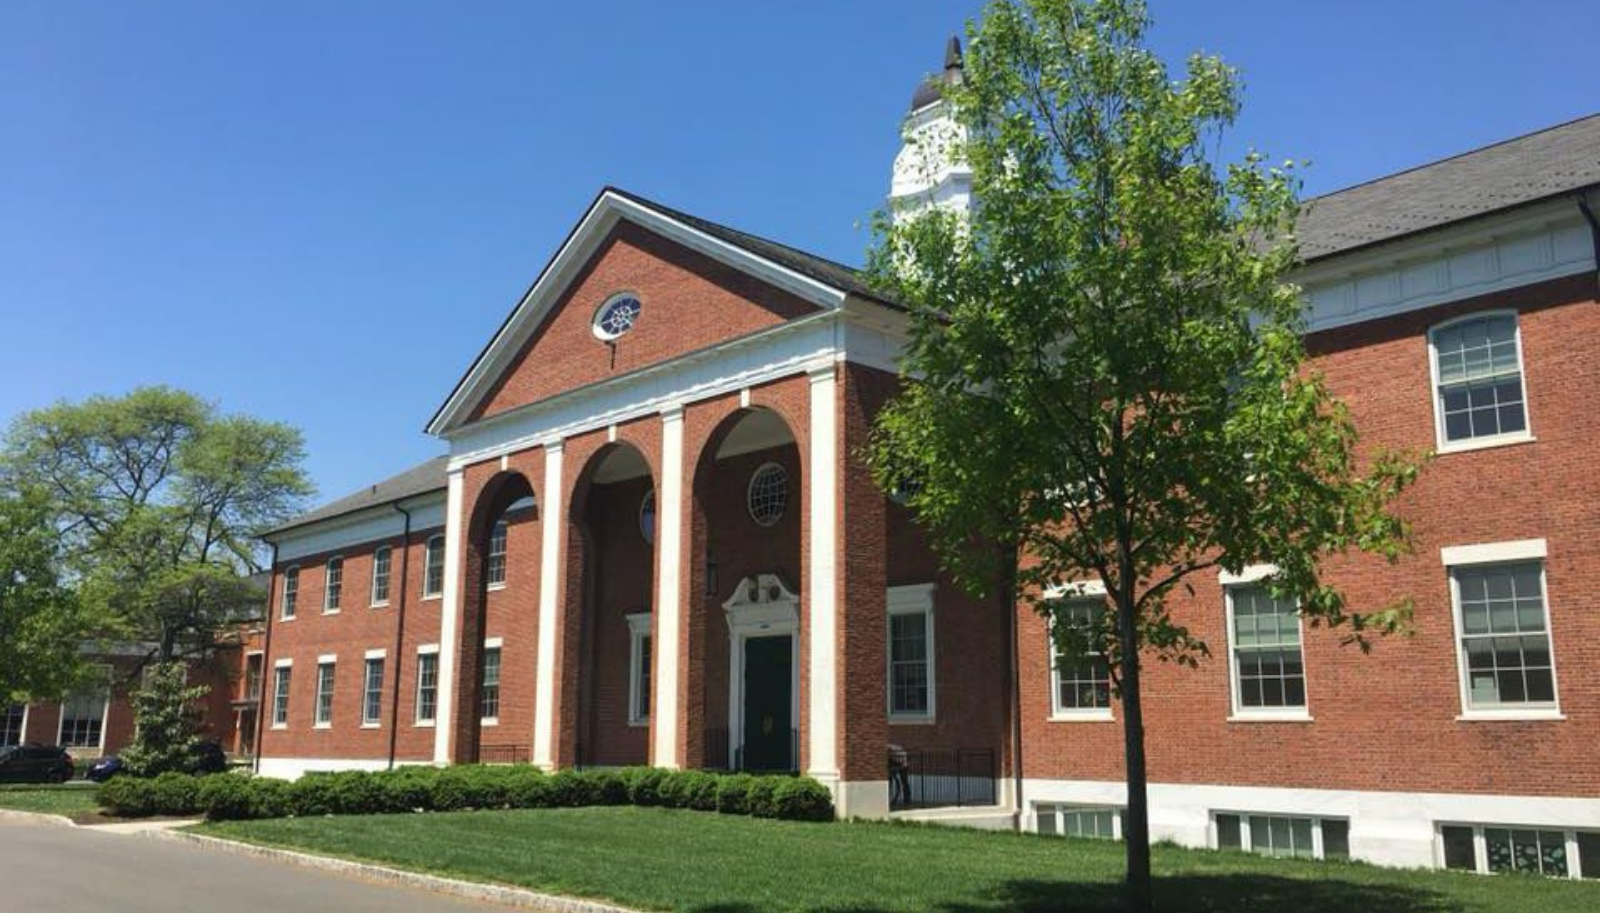 lawrenceville - school - summer - 2021